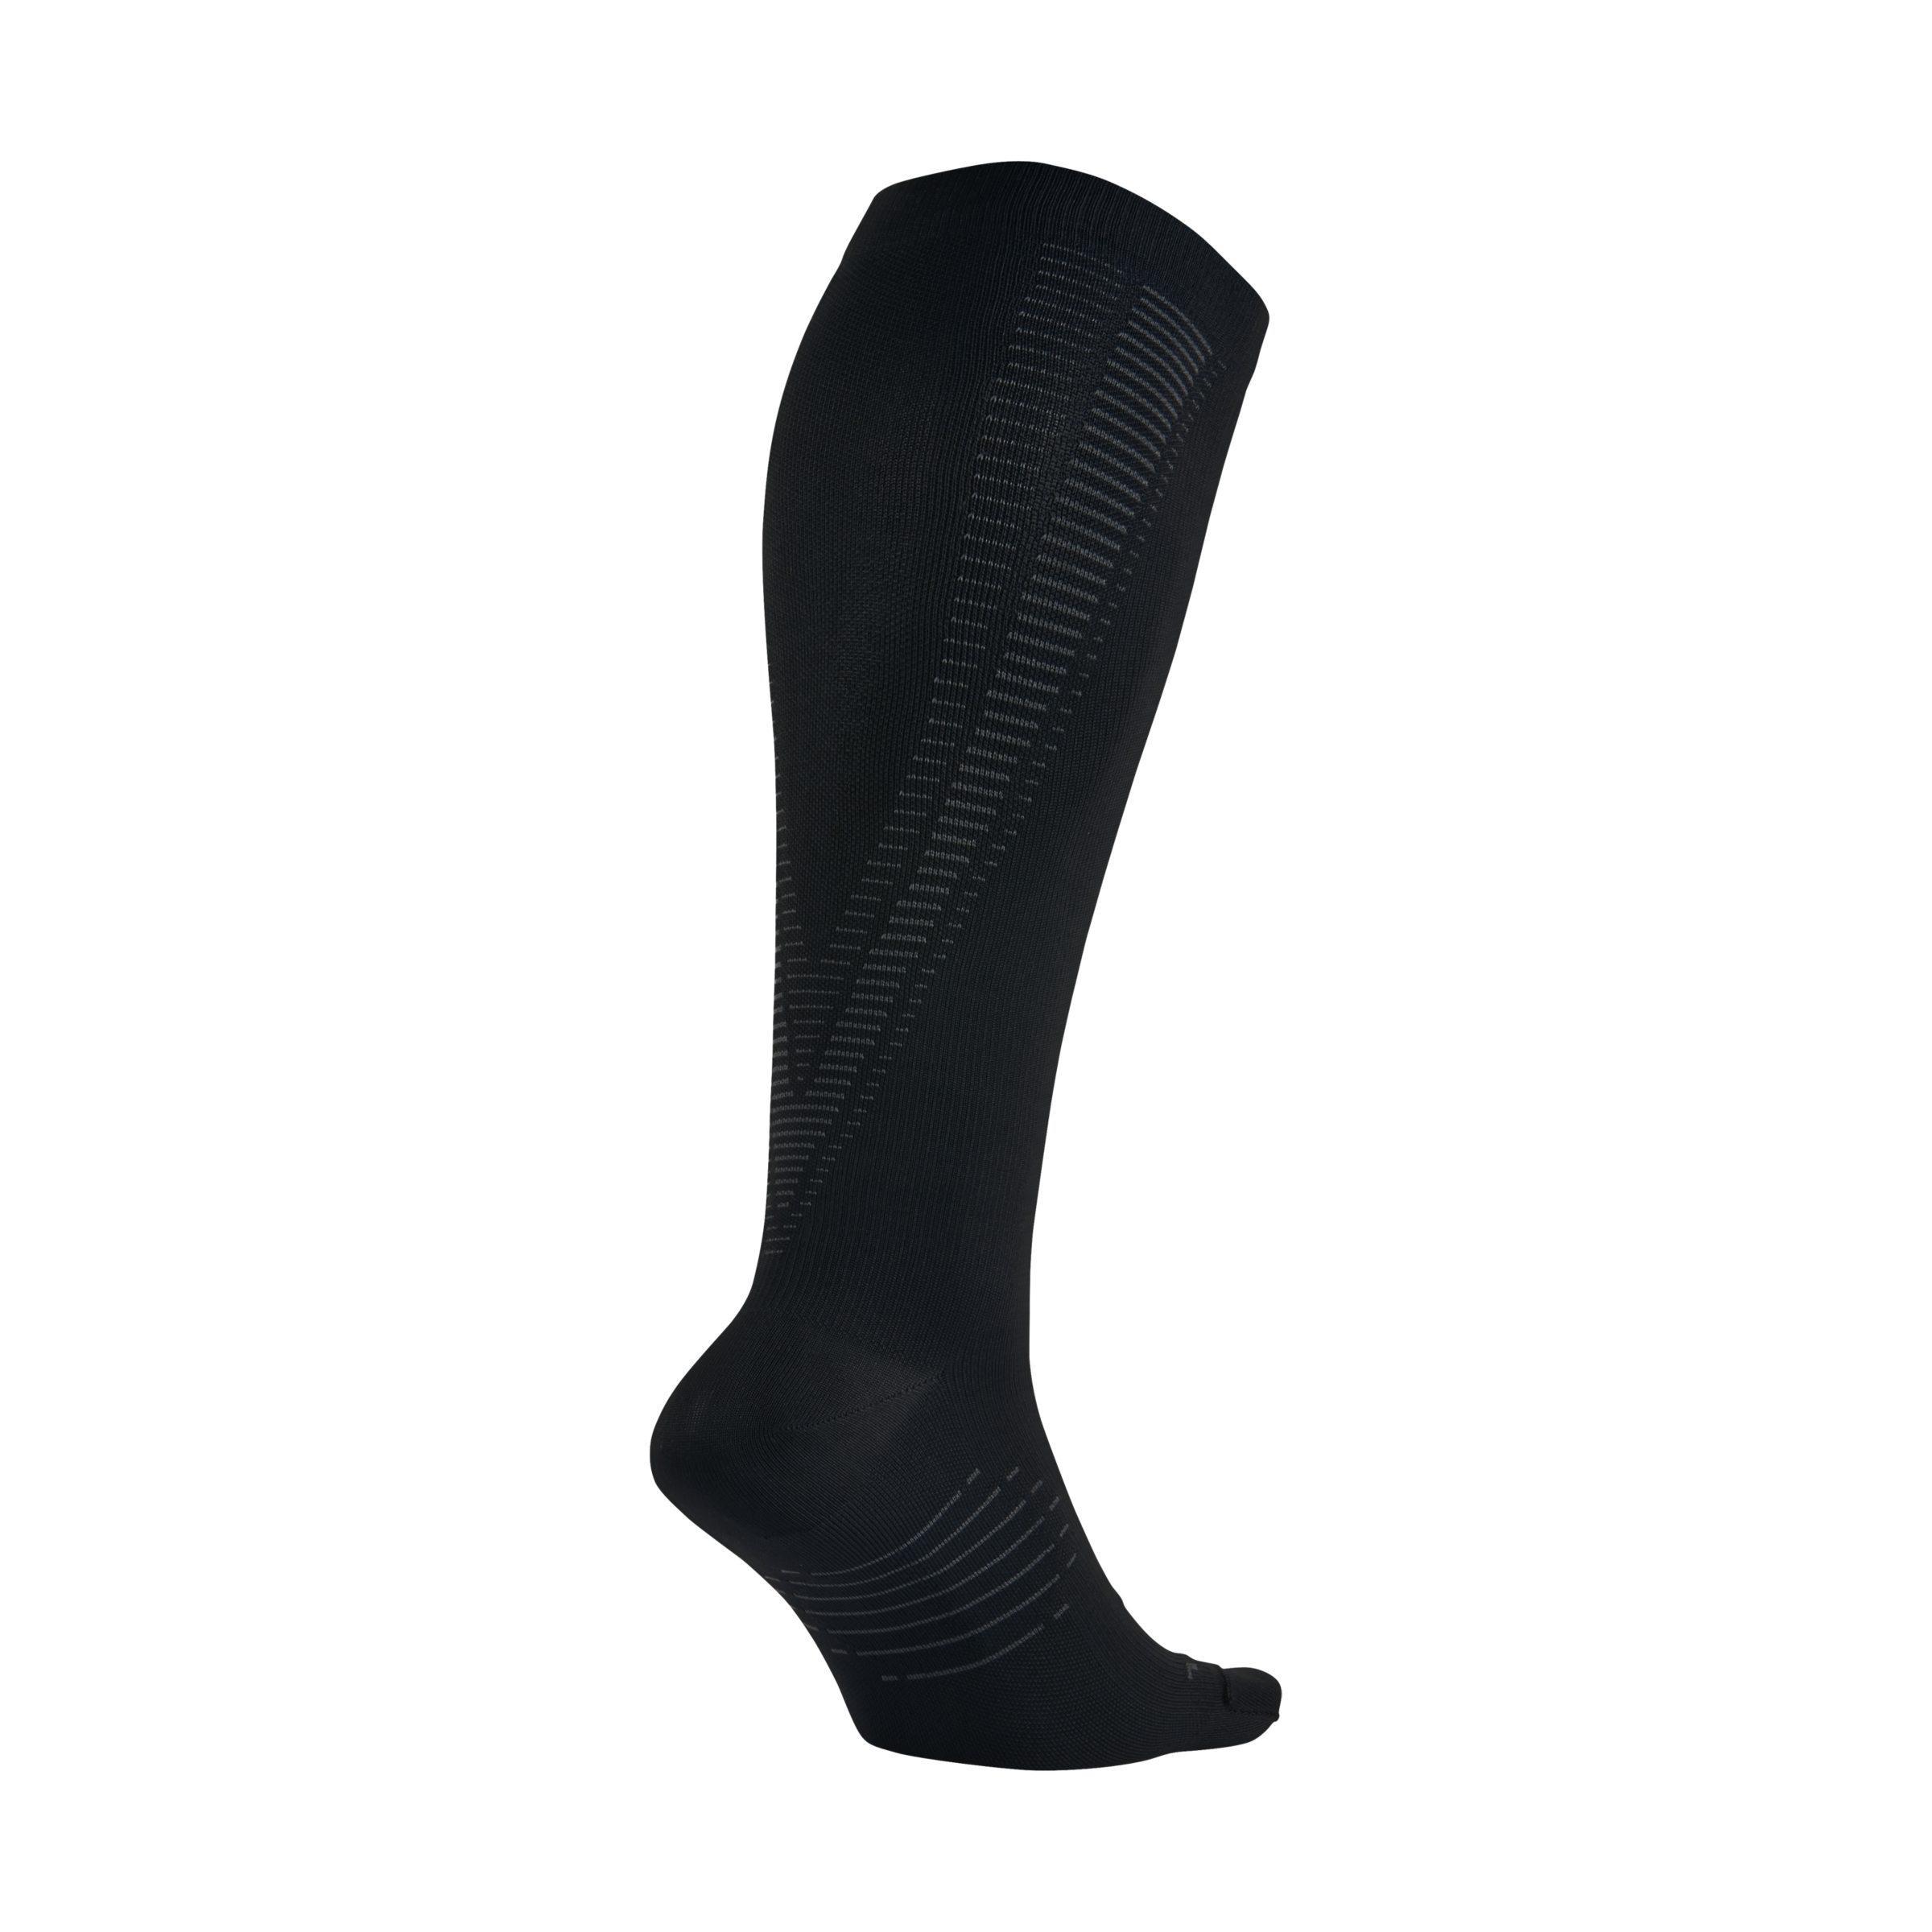 a8277fe34 Women Nike Elite Mens Lightweight Compression Over-The-Calf Running Socks